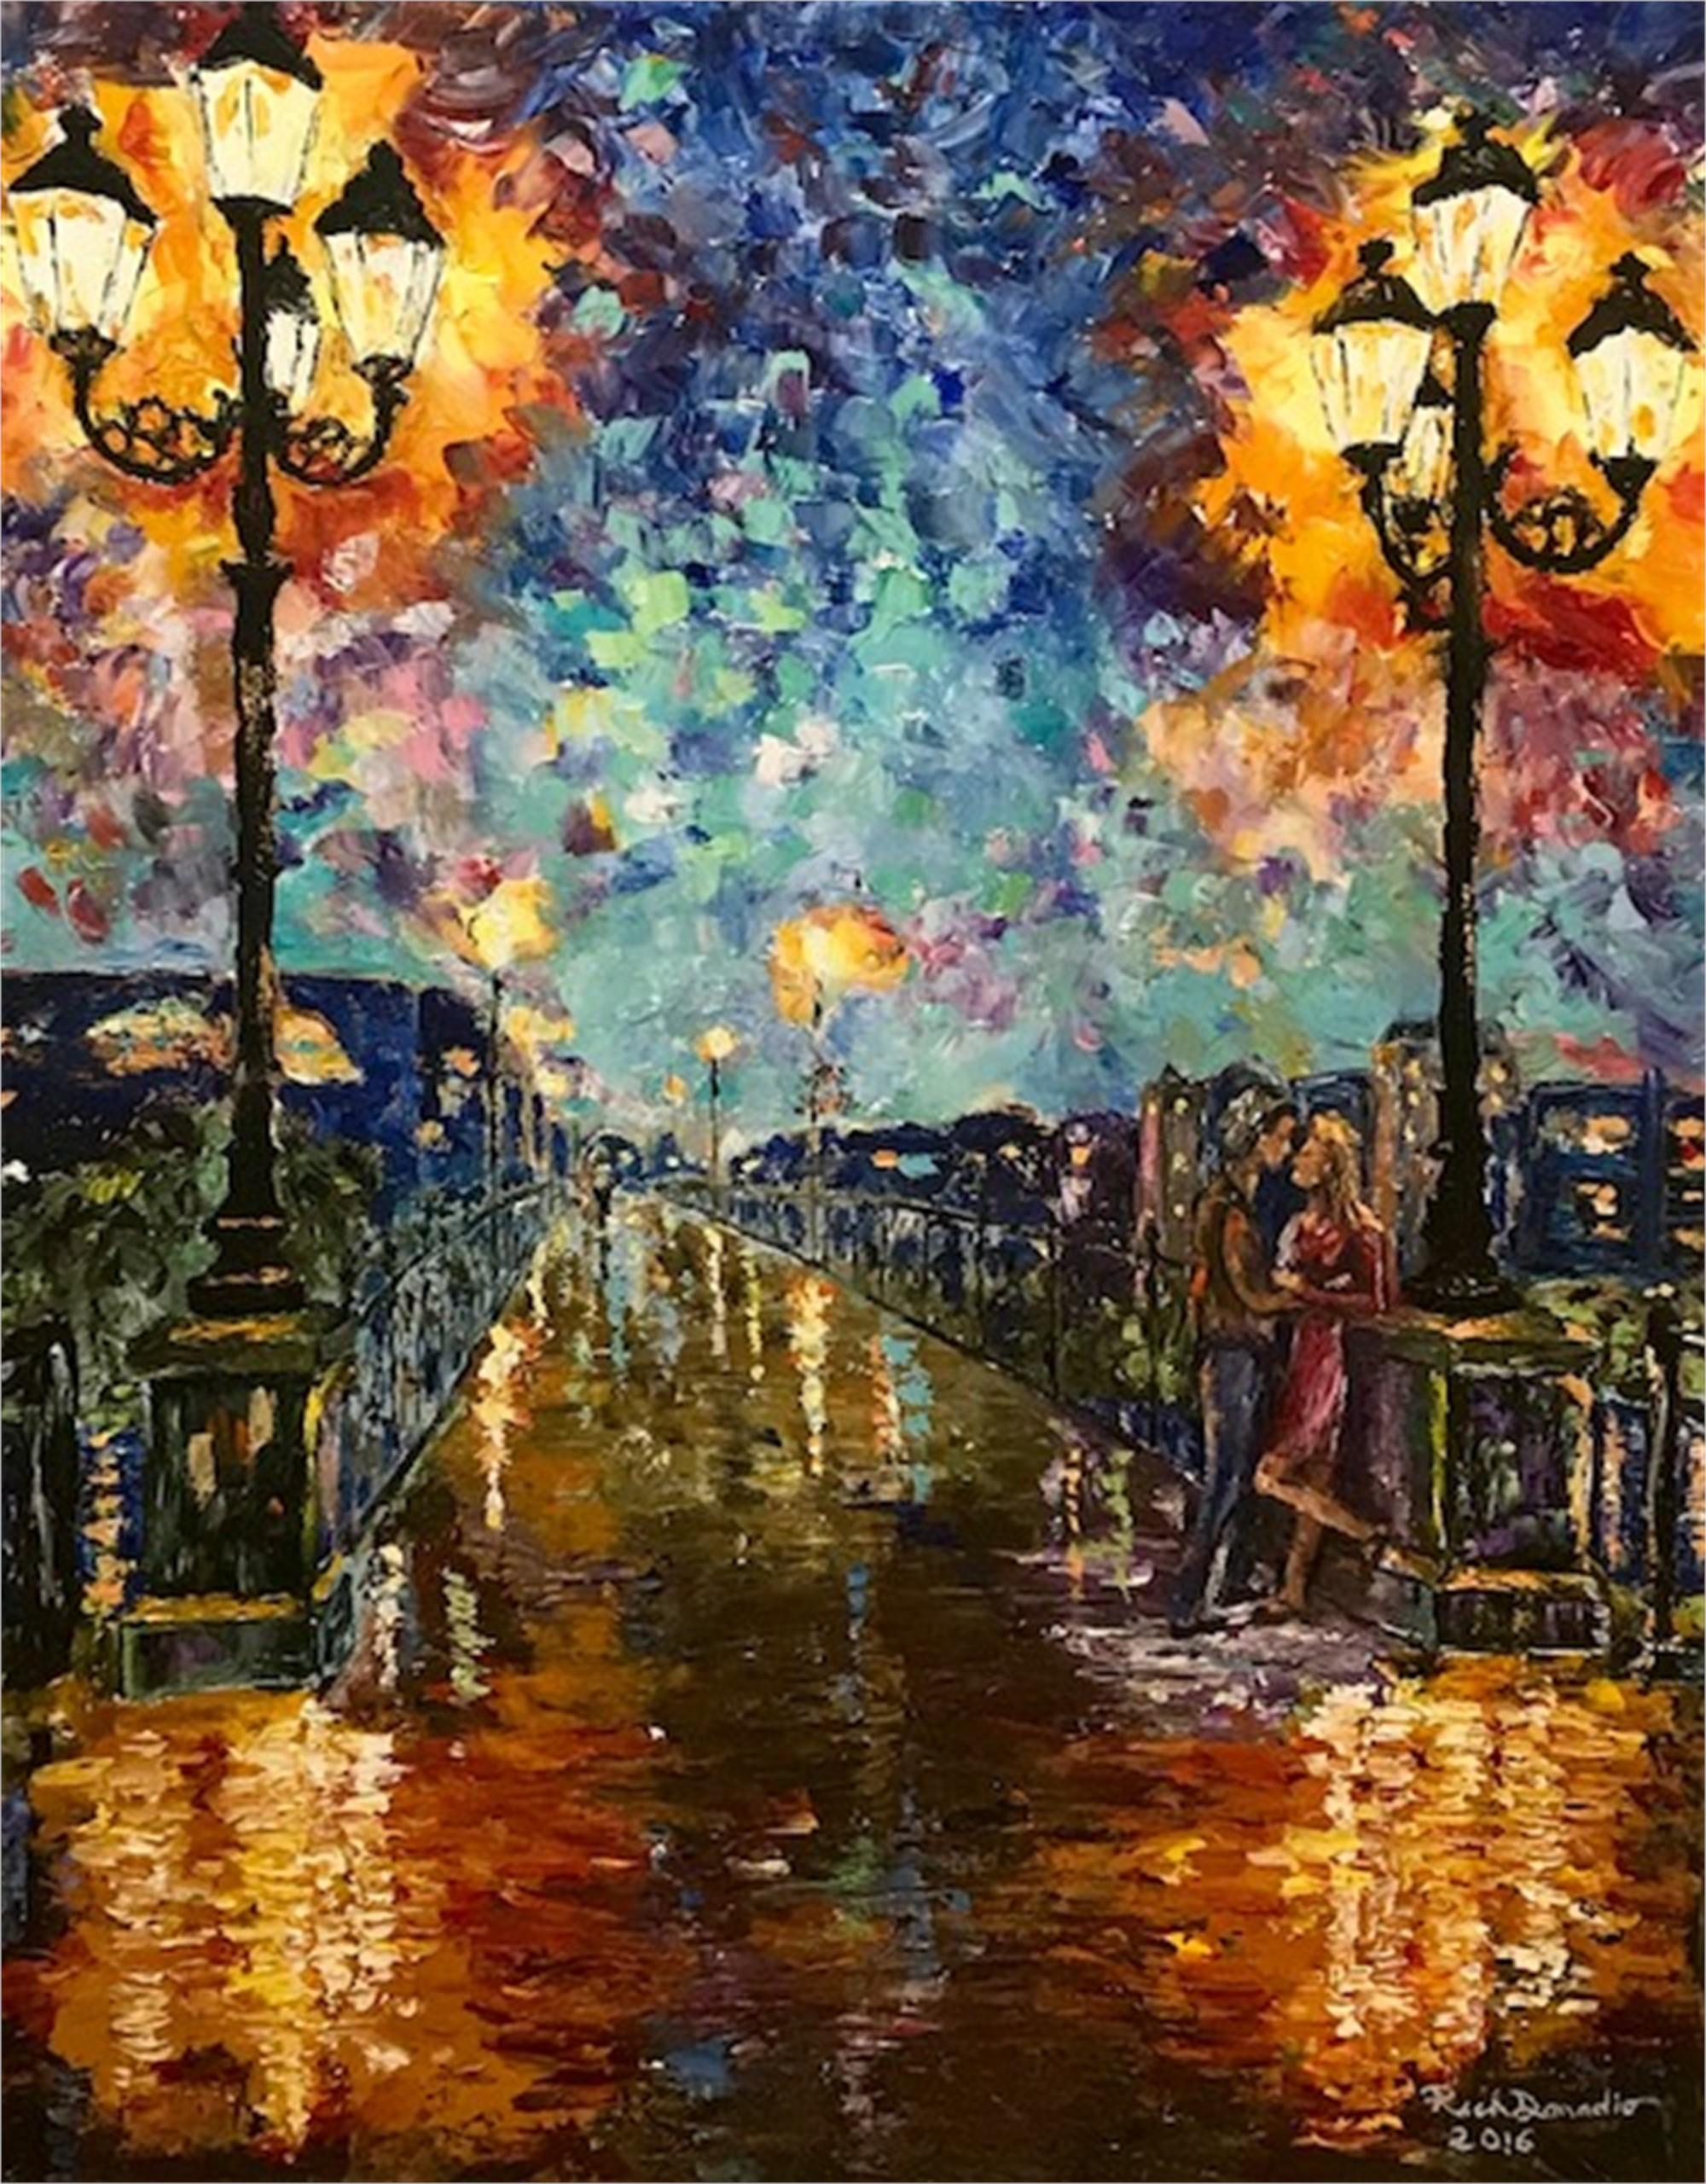 Evening Romance by Richard Donadio